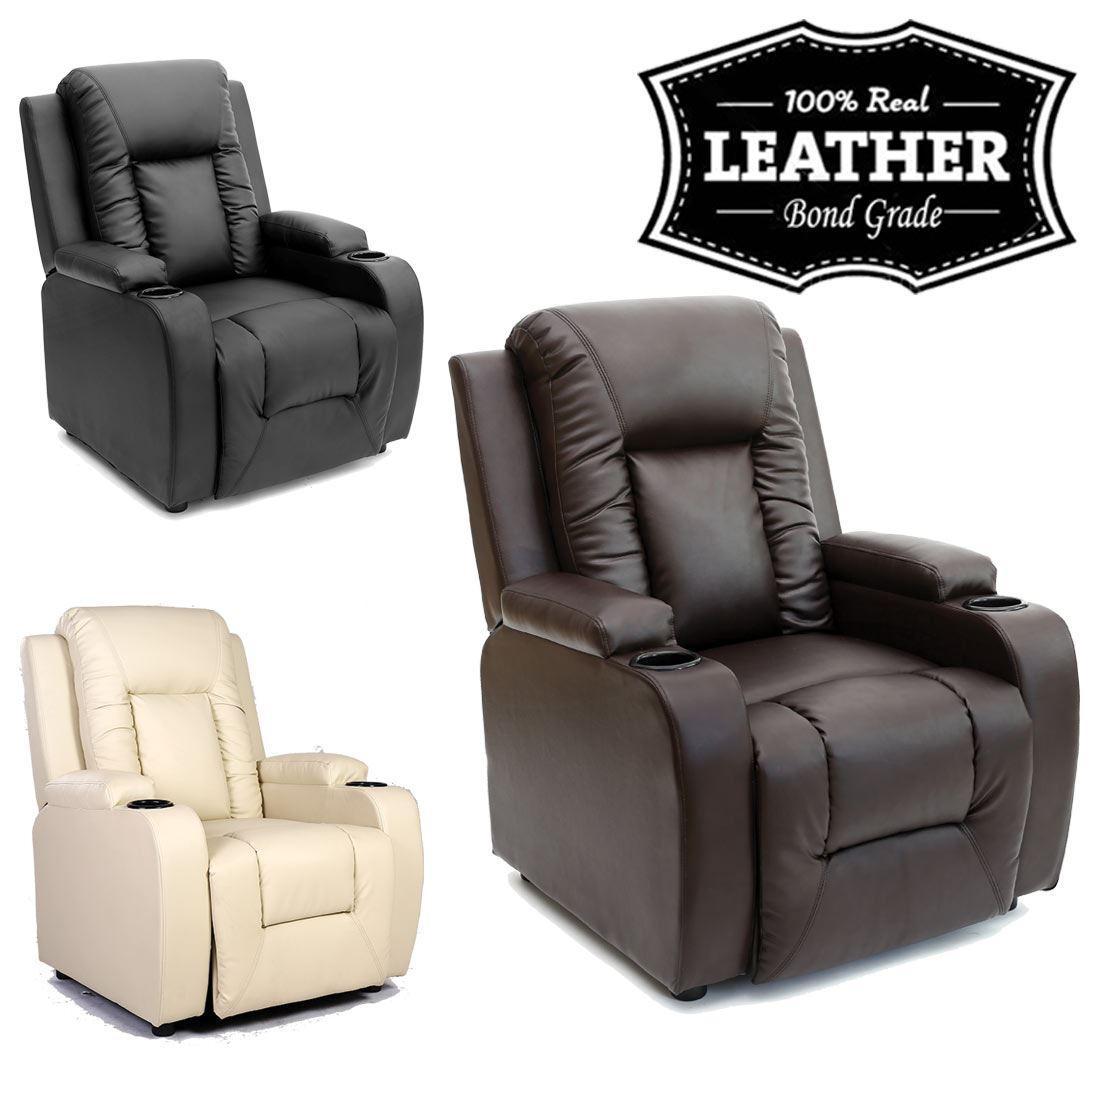 Oscar Leather Recliner W Drink Holders Armchair Sofa Chair Throughout Sofa Chair Recliner (View 20 of 20)